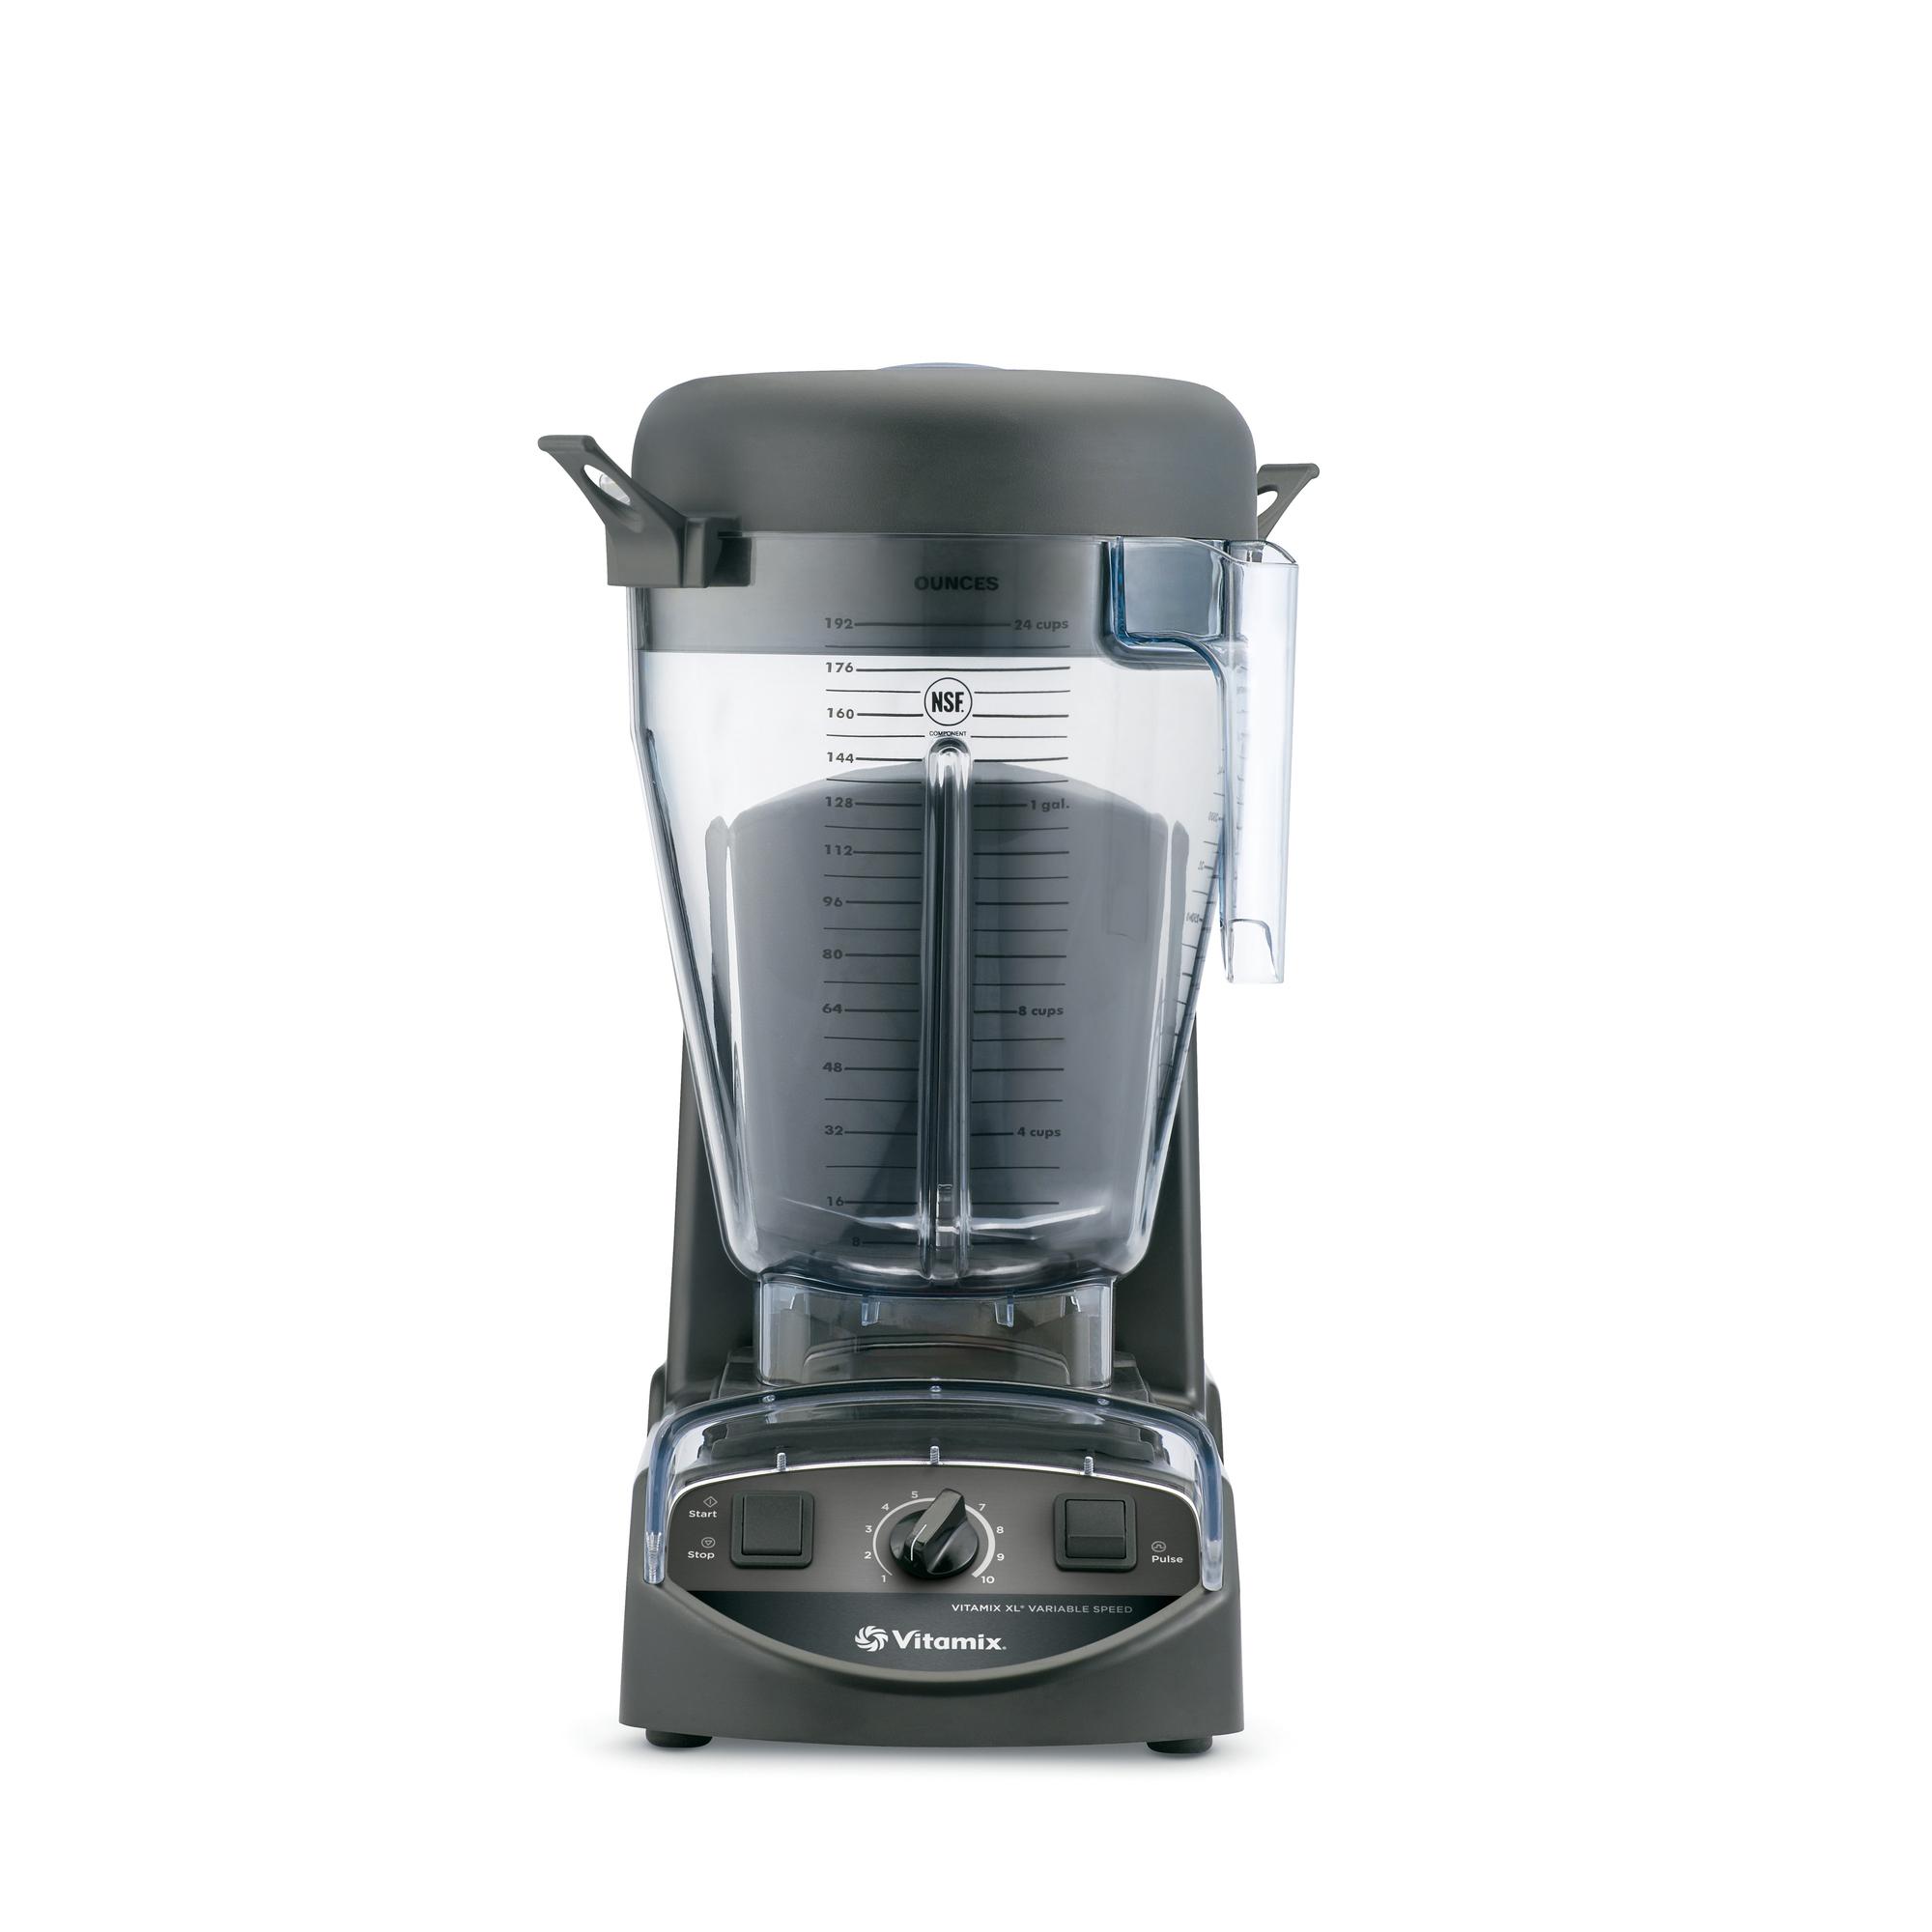 Vitamix 05201 blender, food, countertop